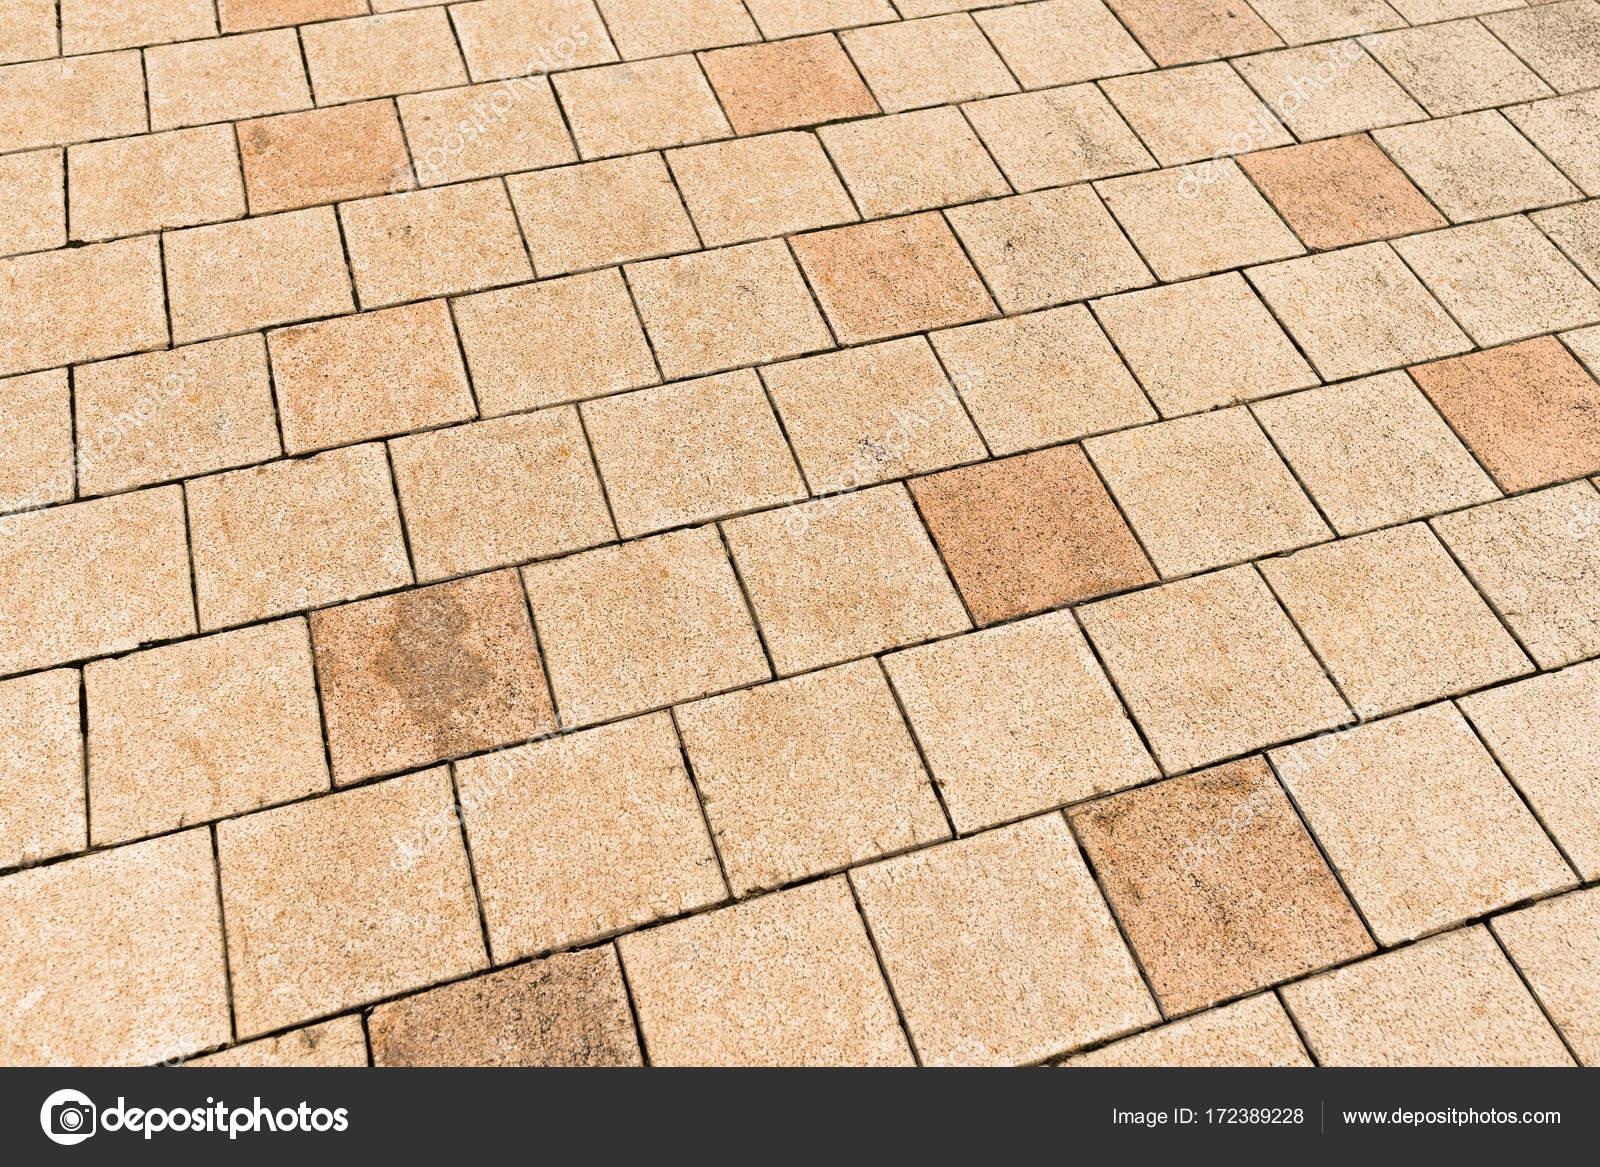 Fußboden Aus Alten Ziegeln ~ Ziegel fußboden hintergrund hautnah u2014 stockfoto © leungchopan #172389228